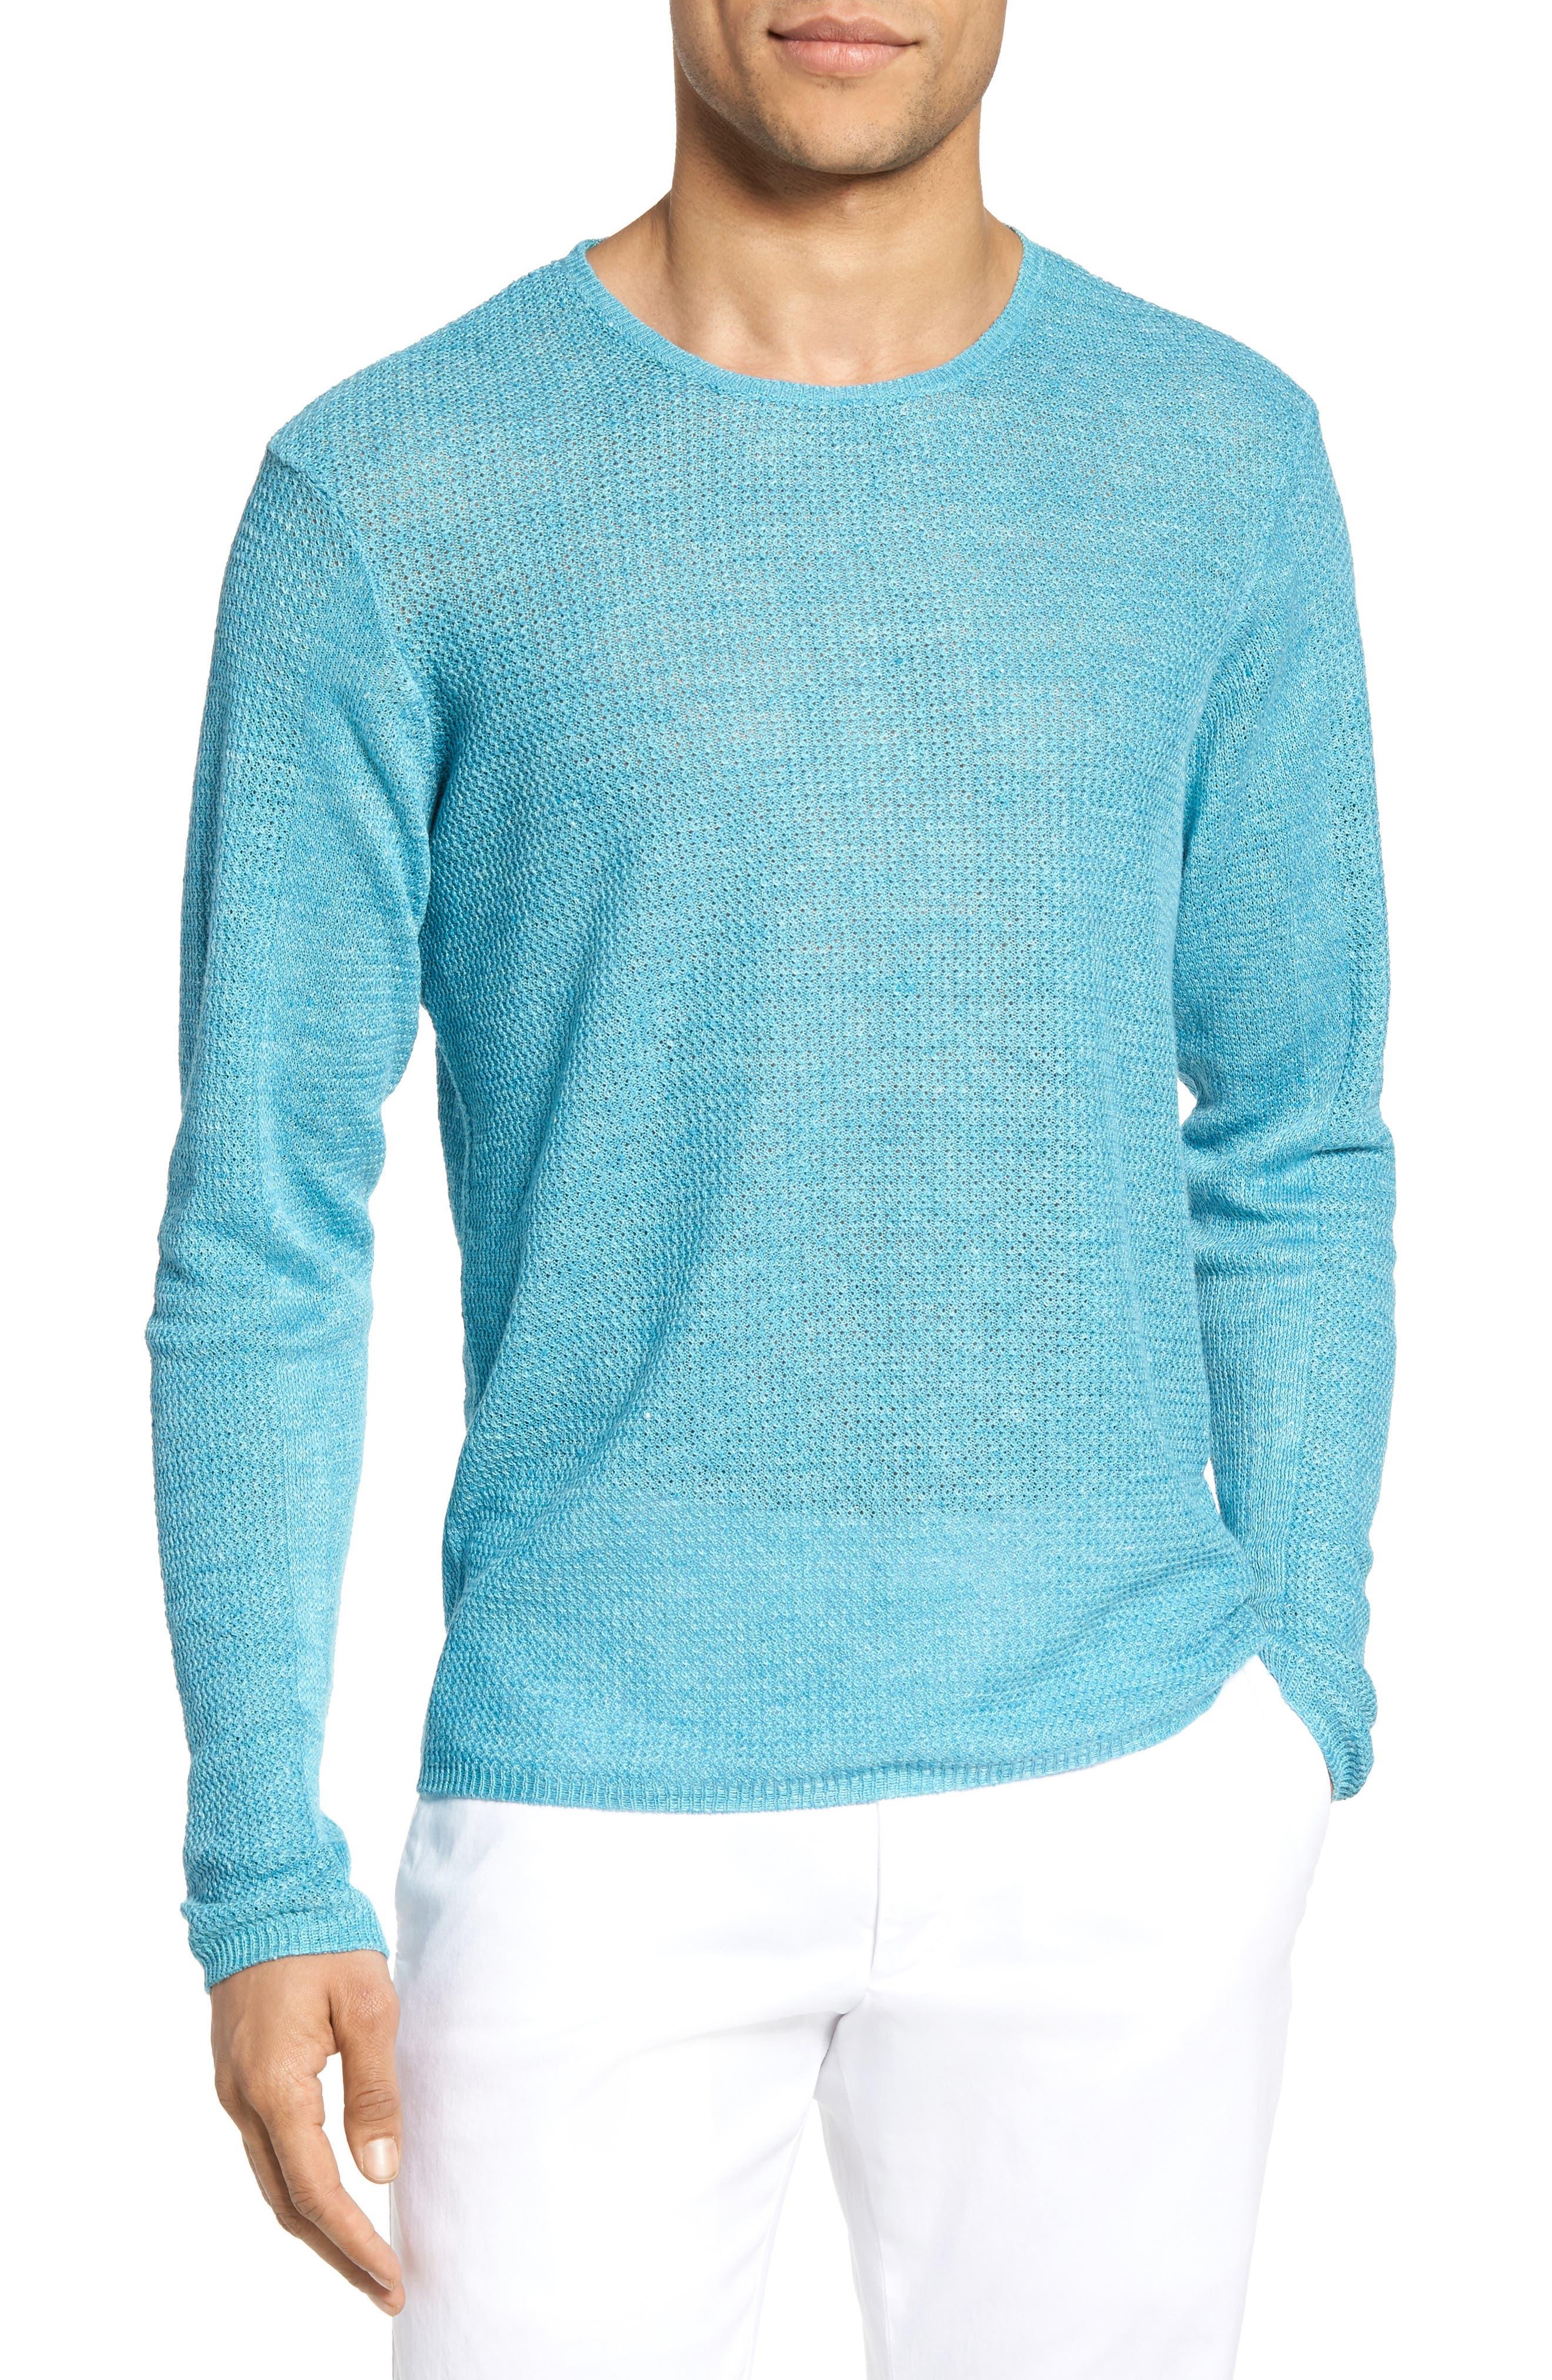 Chapman Linen Sweater,                             Main thumbnail 1, color,                             439